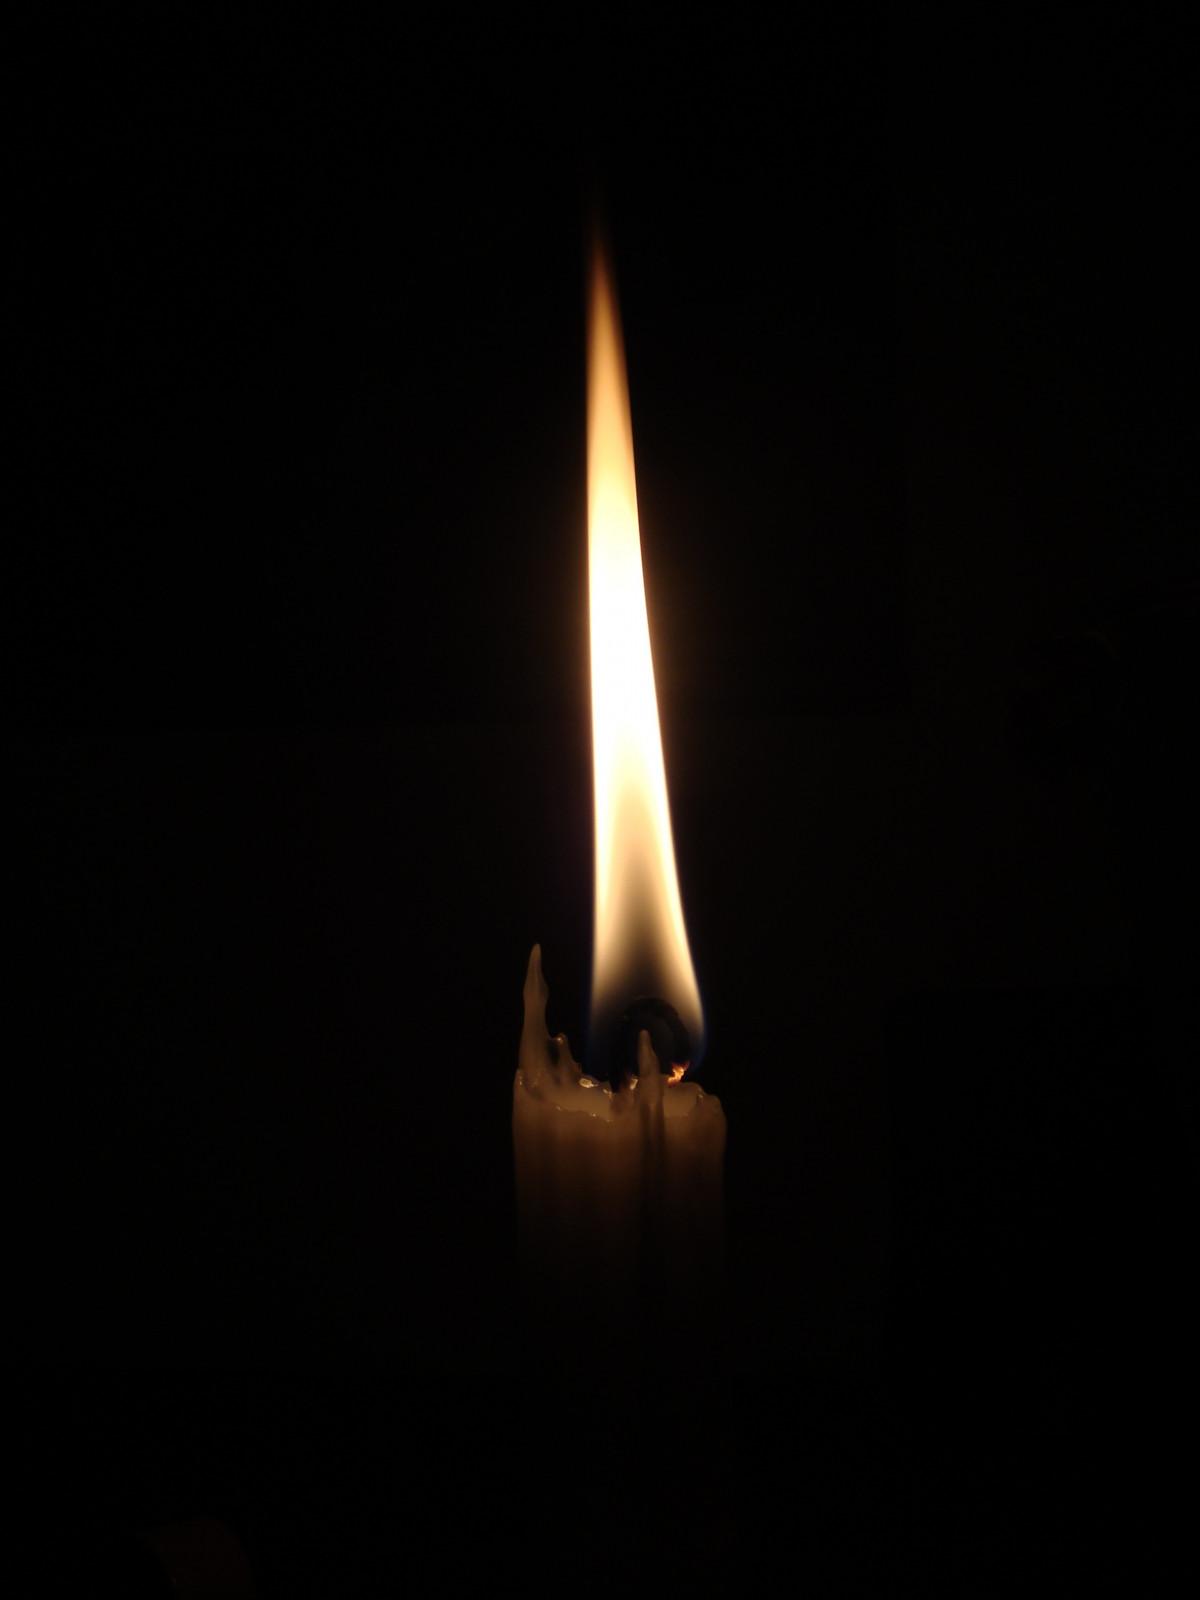 free images light night warm home smoke dark formation